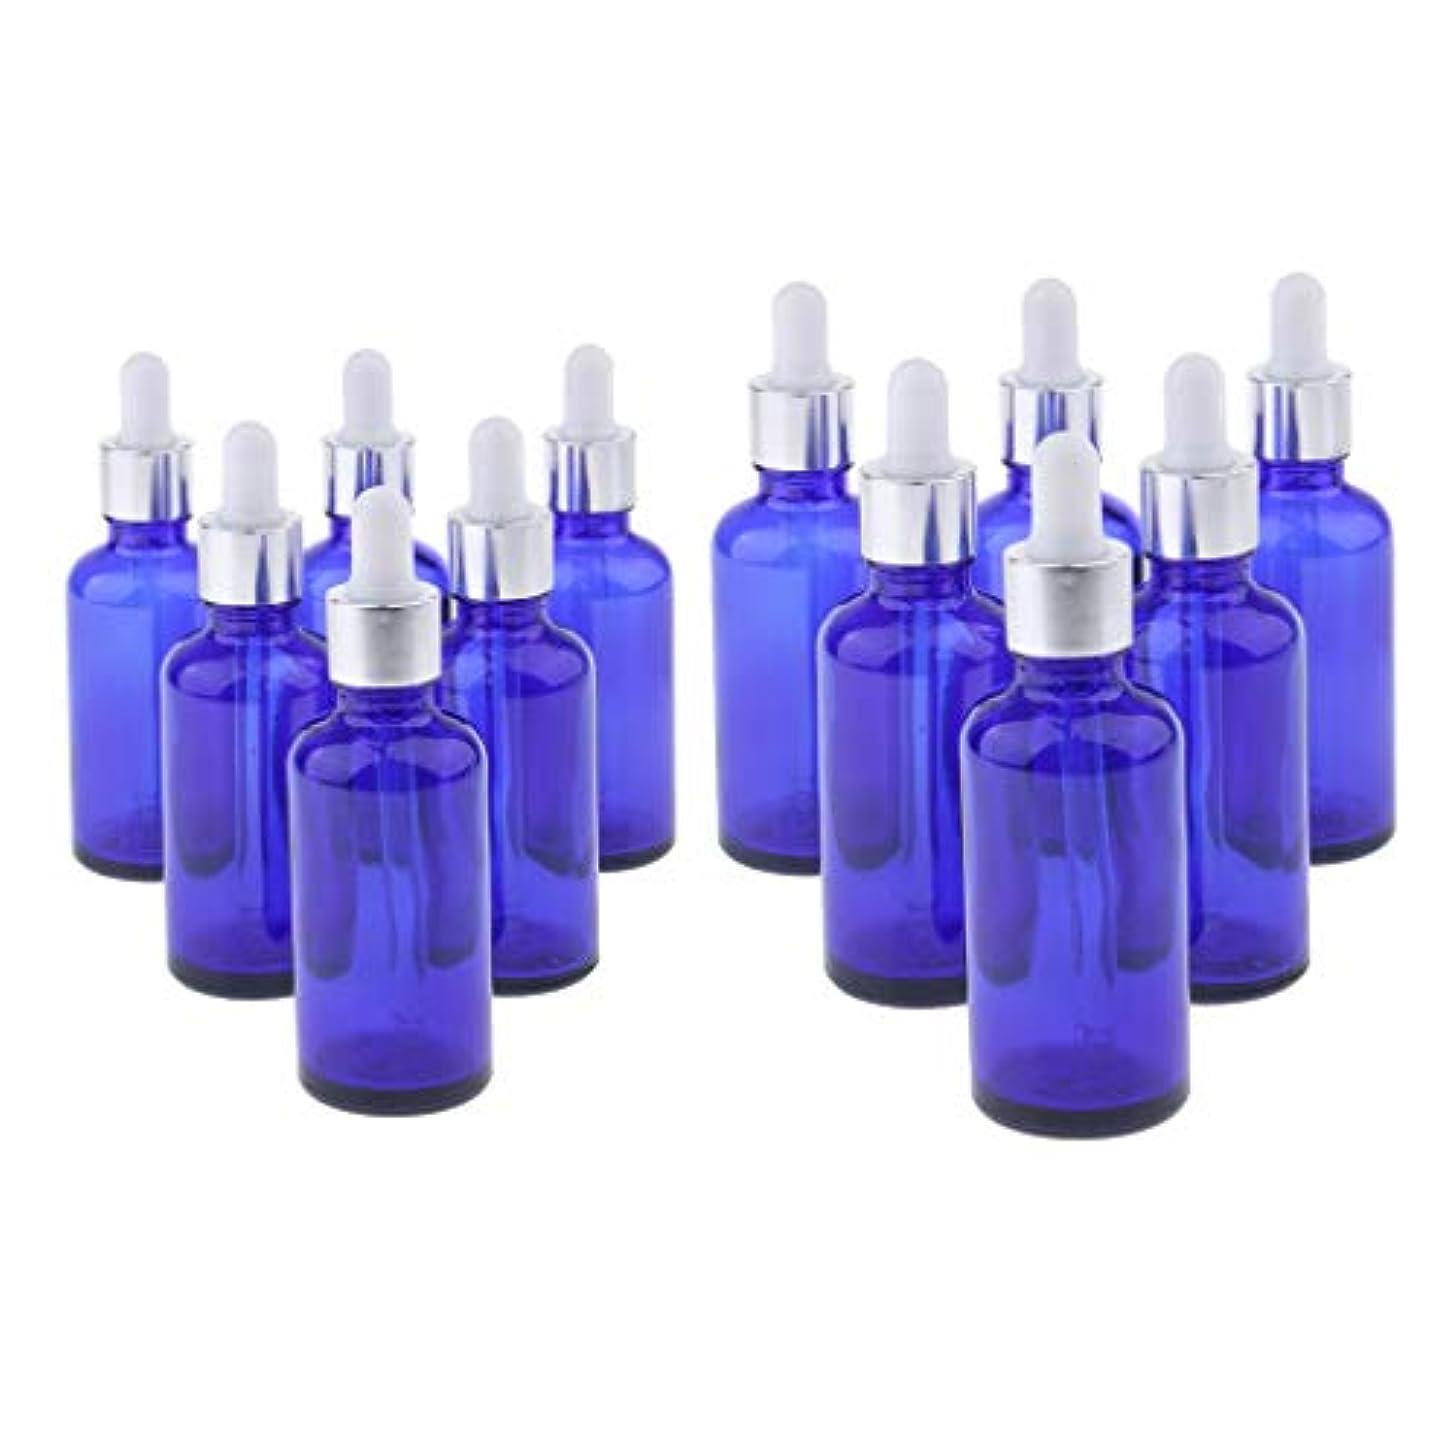 Perfeclan 12個 2サイズ 精油ボトル スポイトボトル ガラス エッセンシャルオイル 香水 保存 詰替え